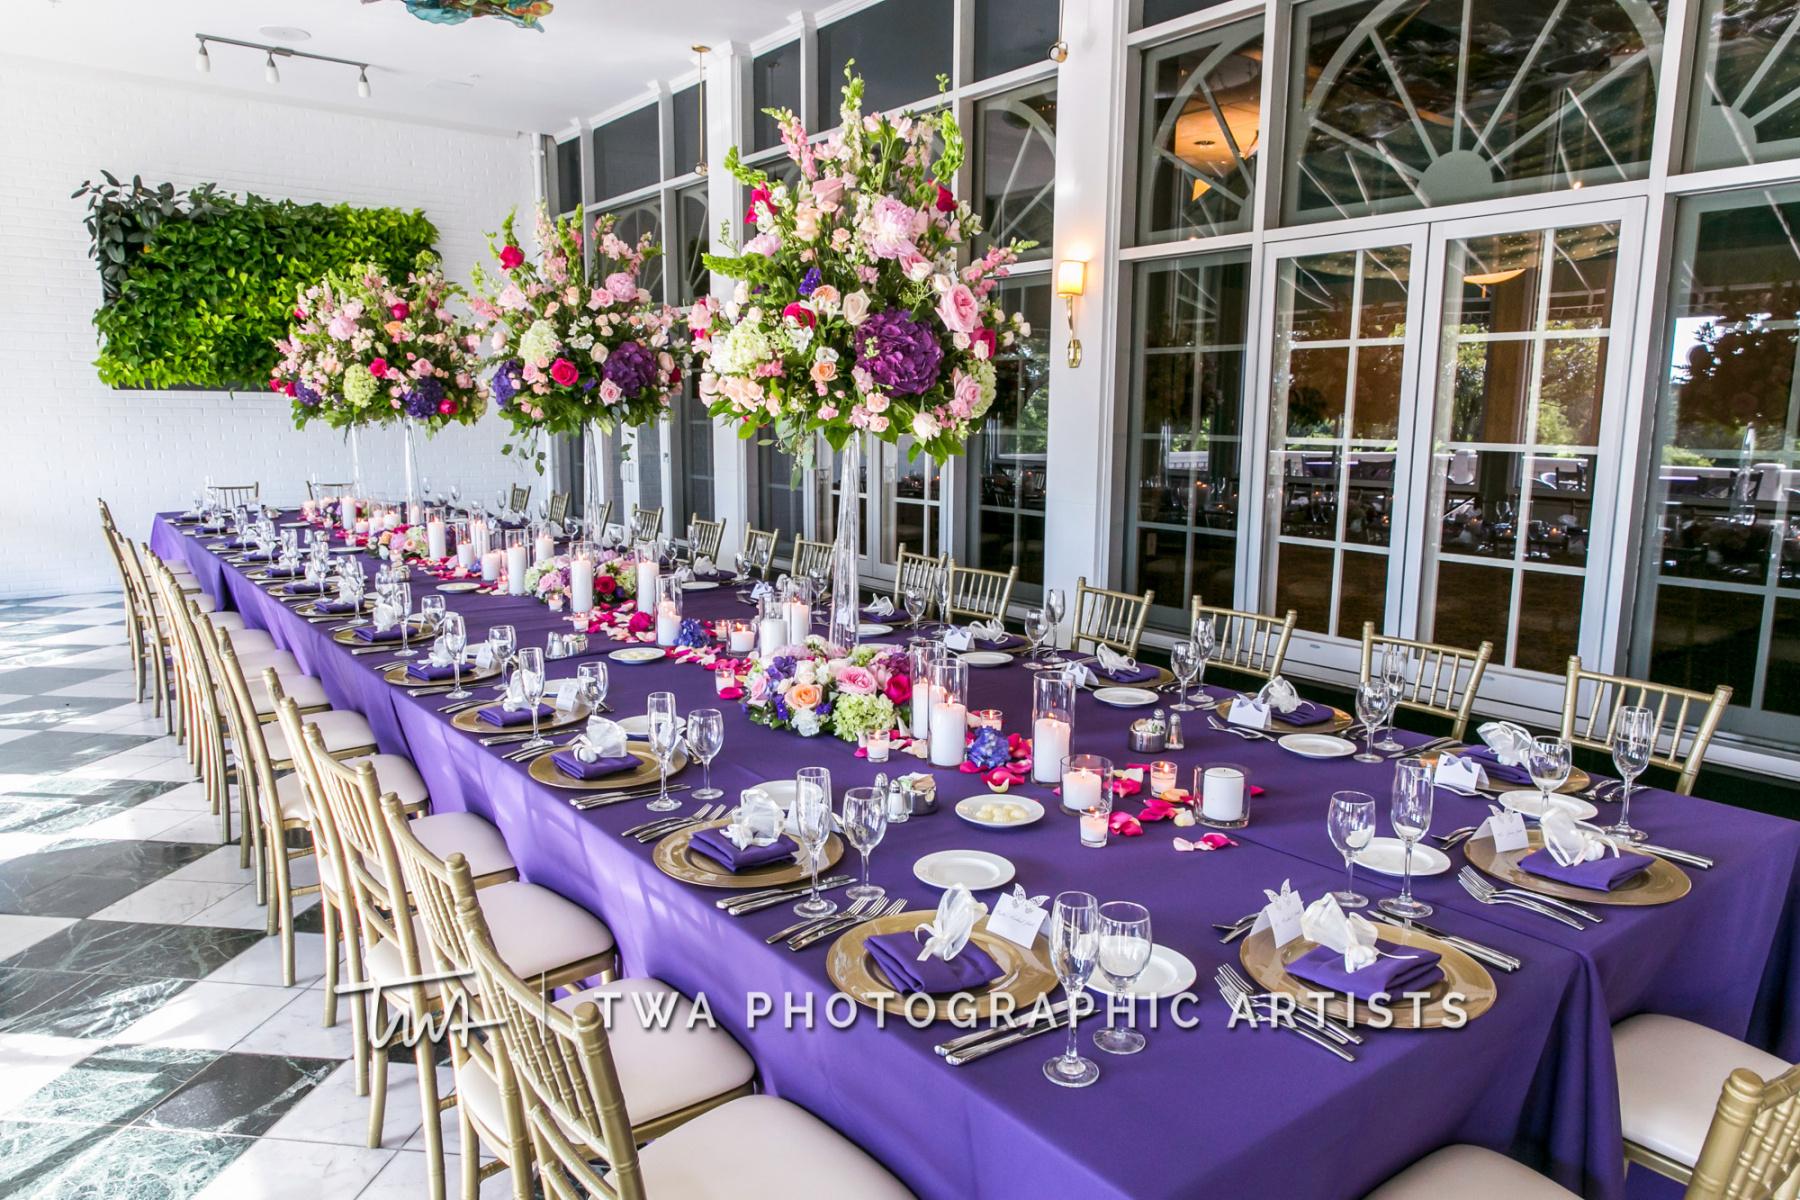 Chicago-Wedding-Photographer-TWA-Photographic-Artists-Drake-Oak-Brook_Telios_Englram_DR-0045